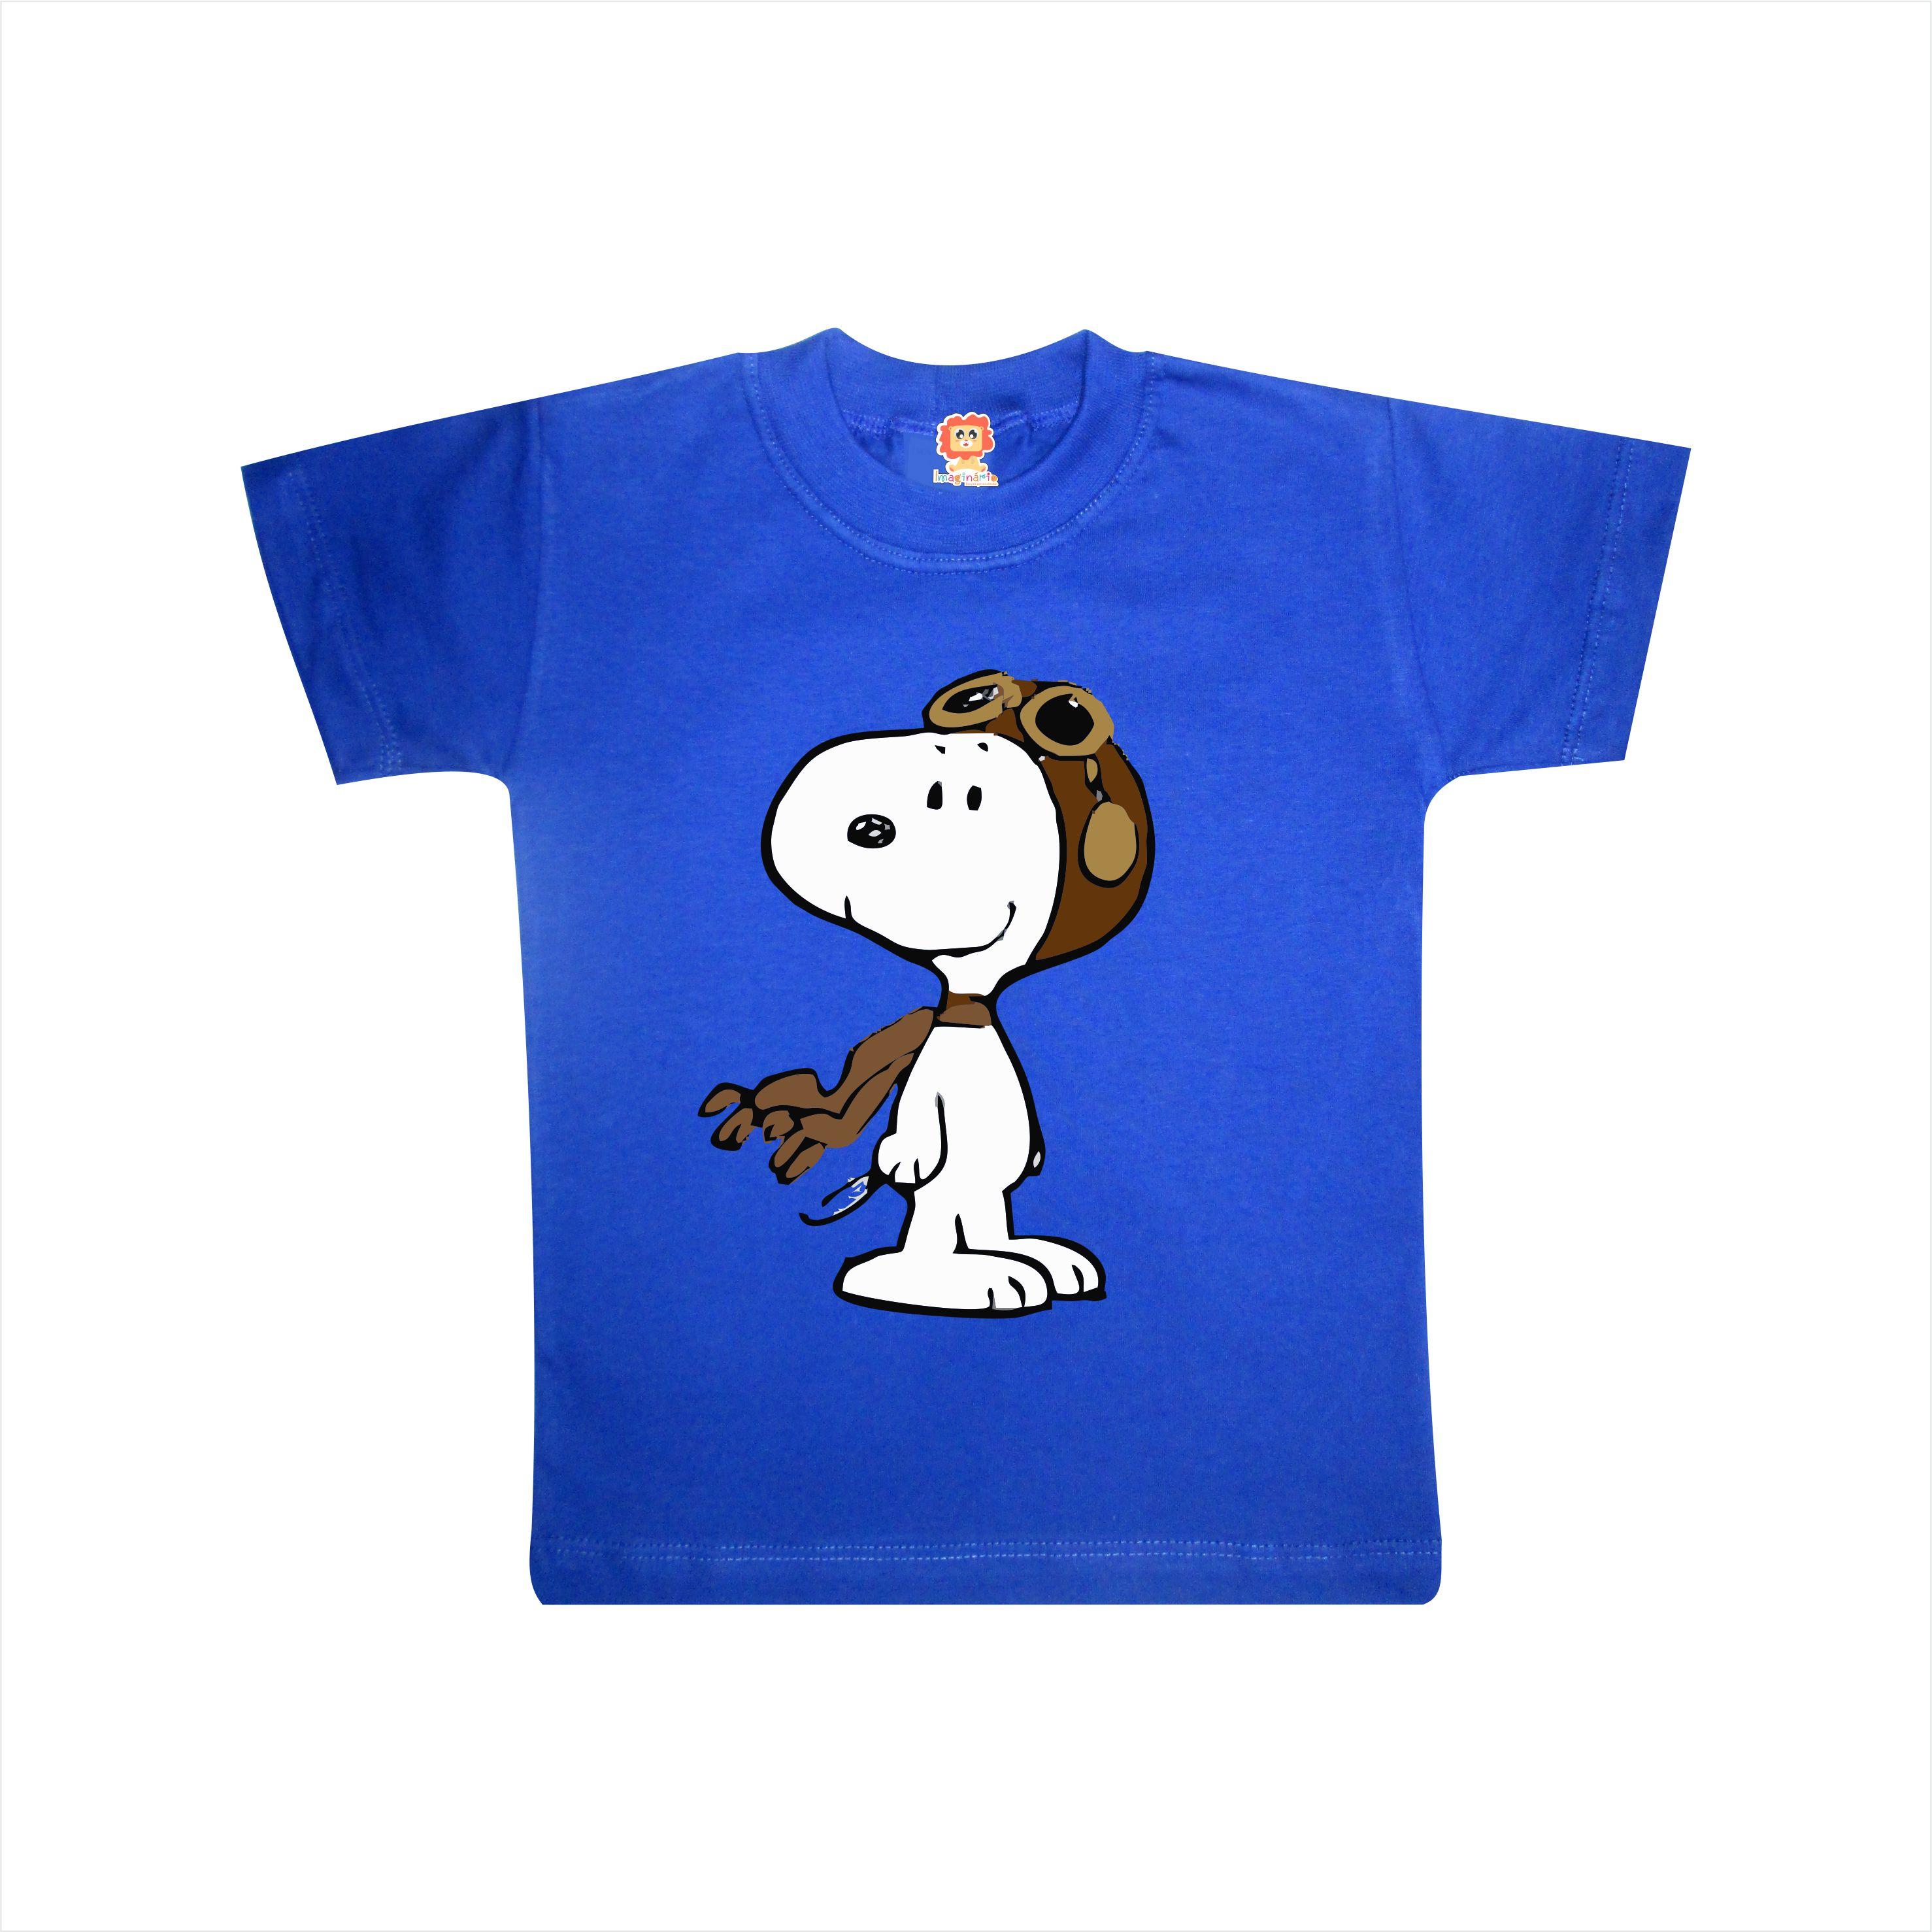 Camiseta Ou Body Love Snoopy  684c14c18c61b